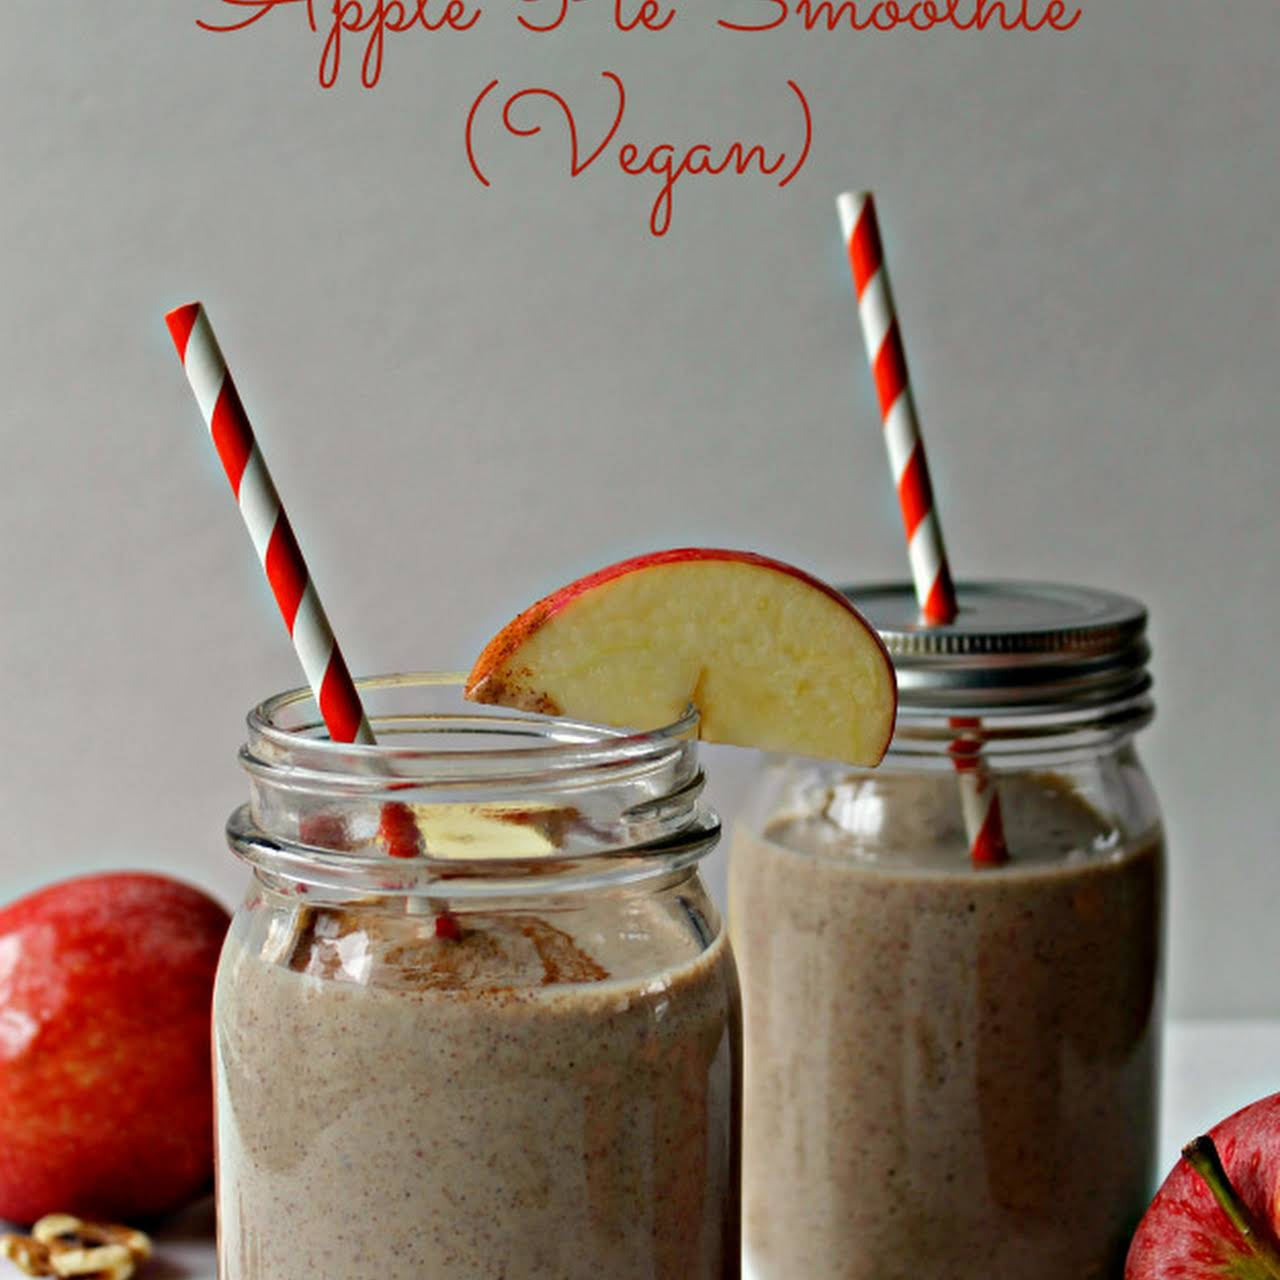 Apple Pie Smoothie (Vegan)